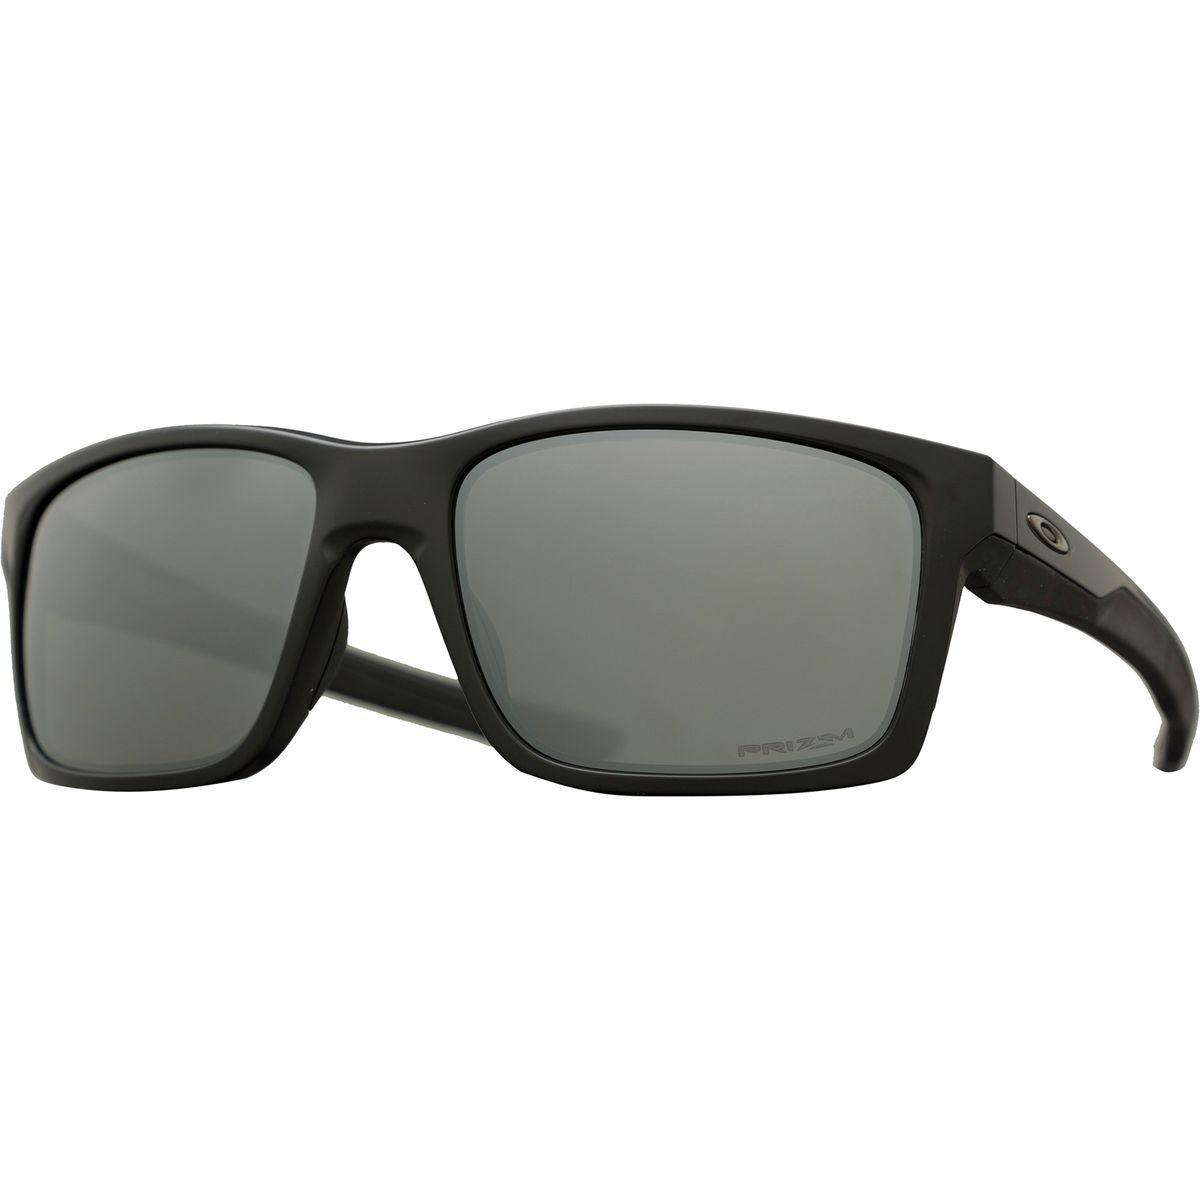 3cdd39bc2e Lyst - Oakley Mainlink Prizm Sunglasses - Polarized in Black for Men